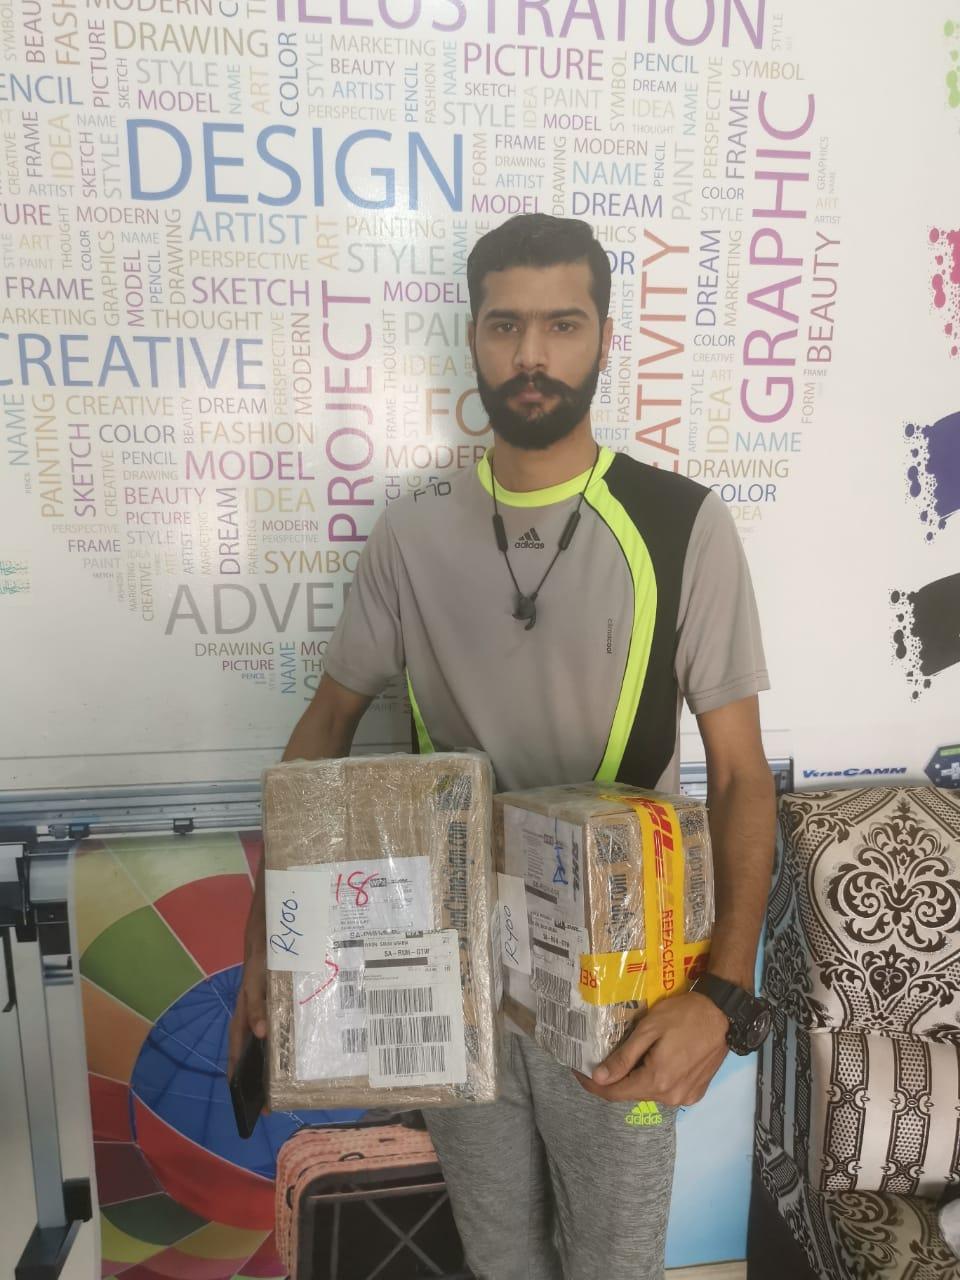 Arabia Saudita-Sr.Fezan UL Hassan comprio Repuestos de Plotters